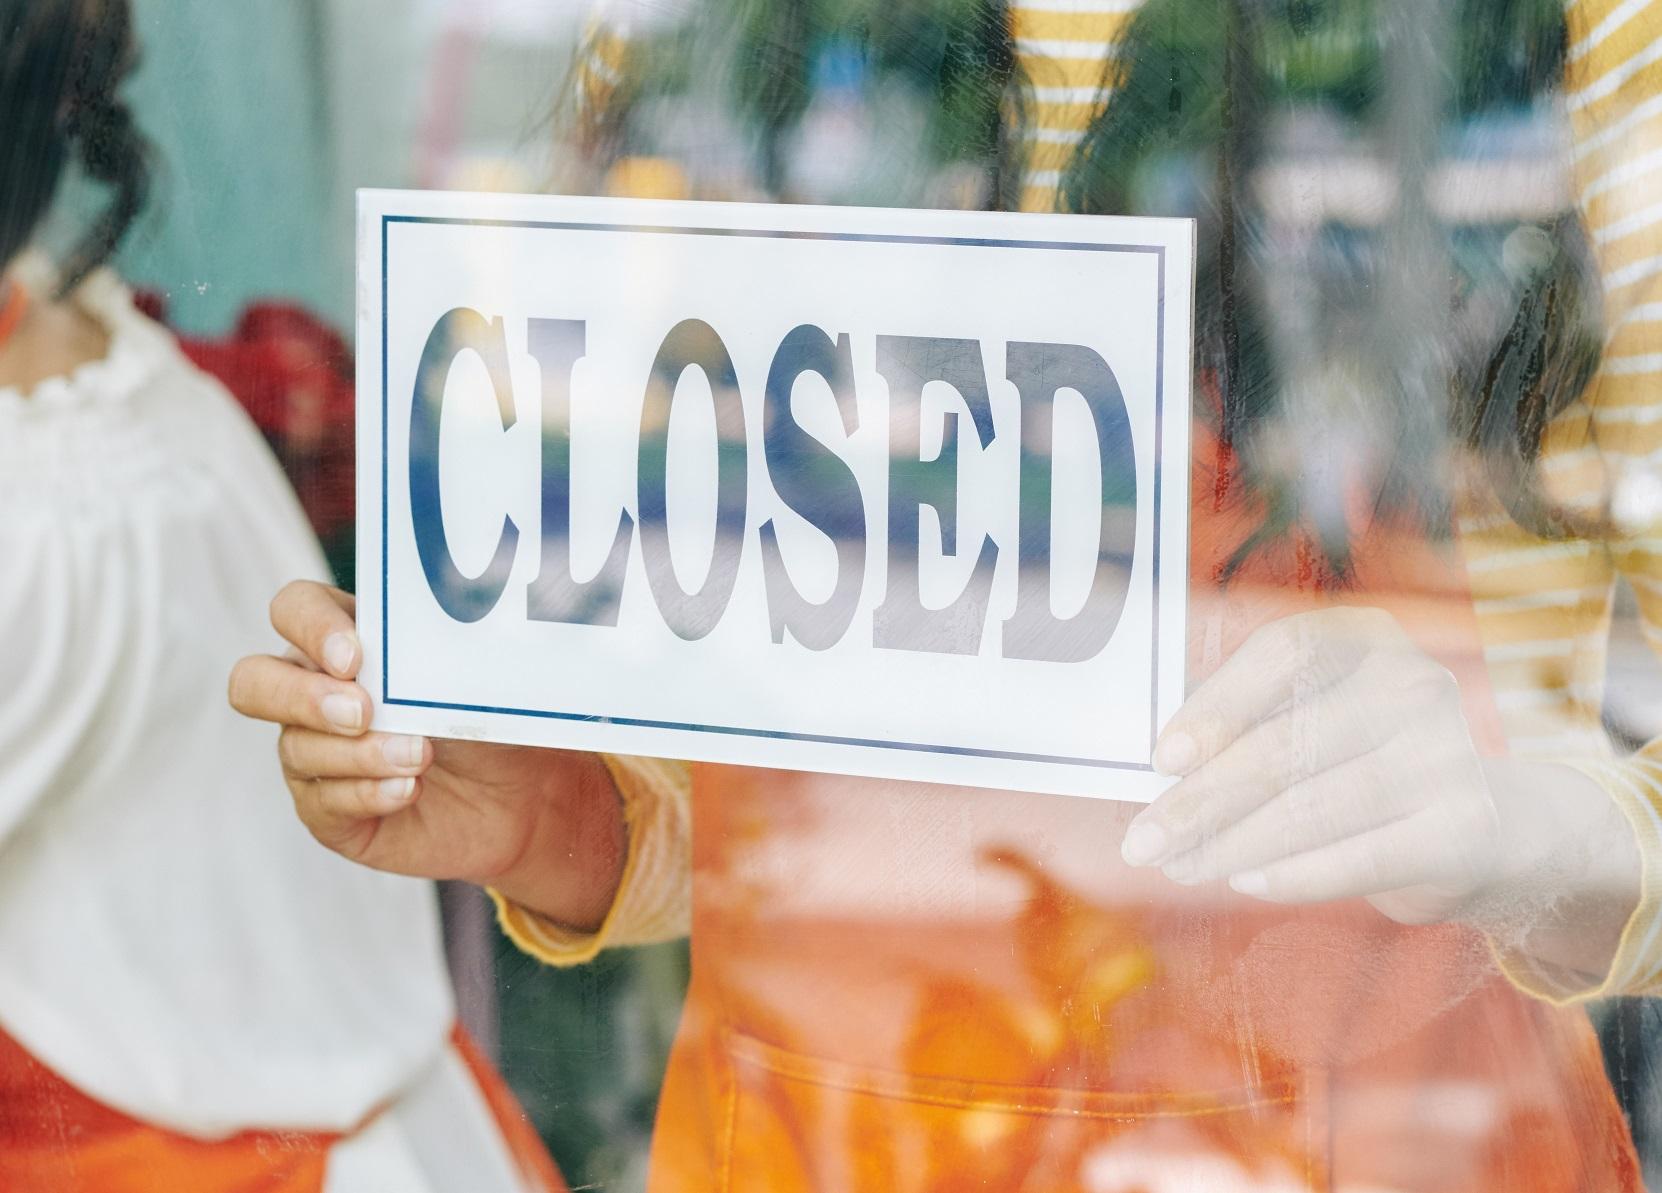 florist closing store C3VJ7HC бизнес бизнес